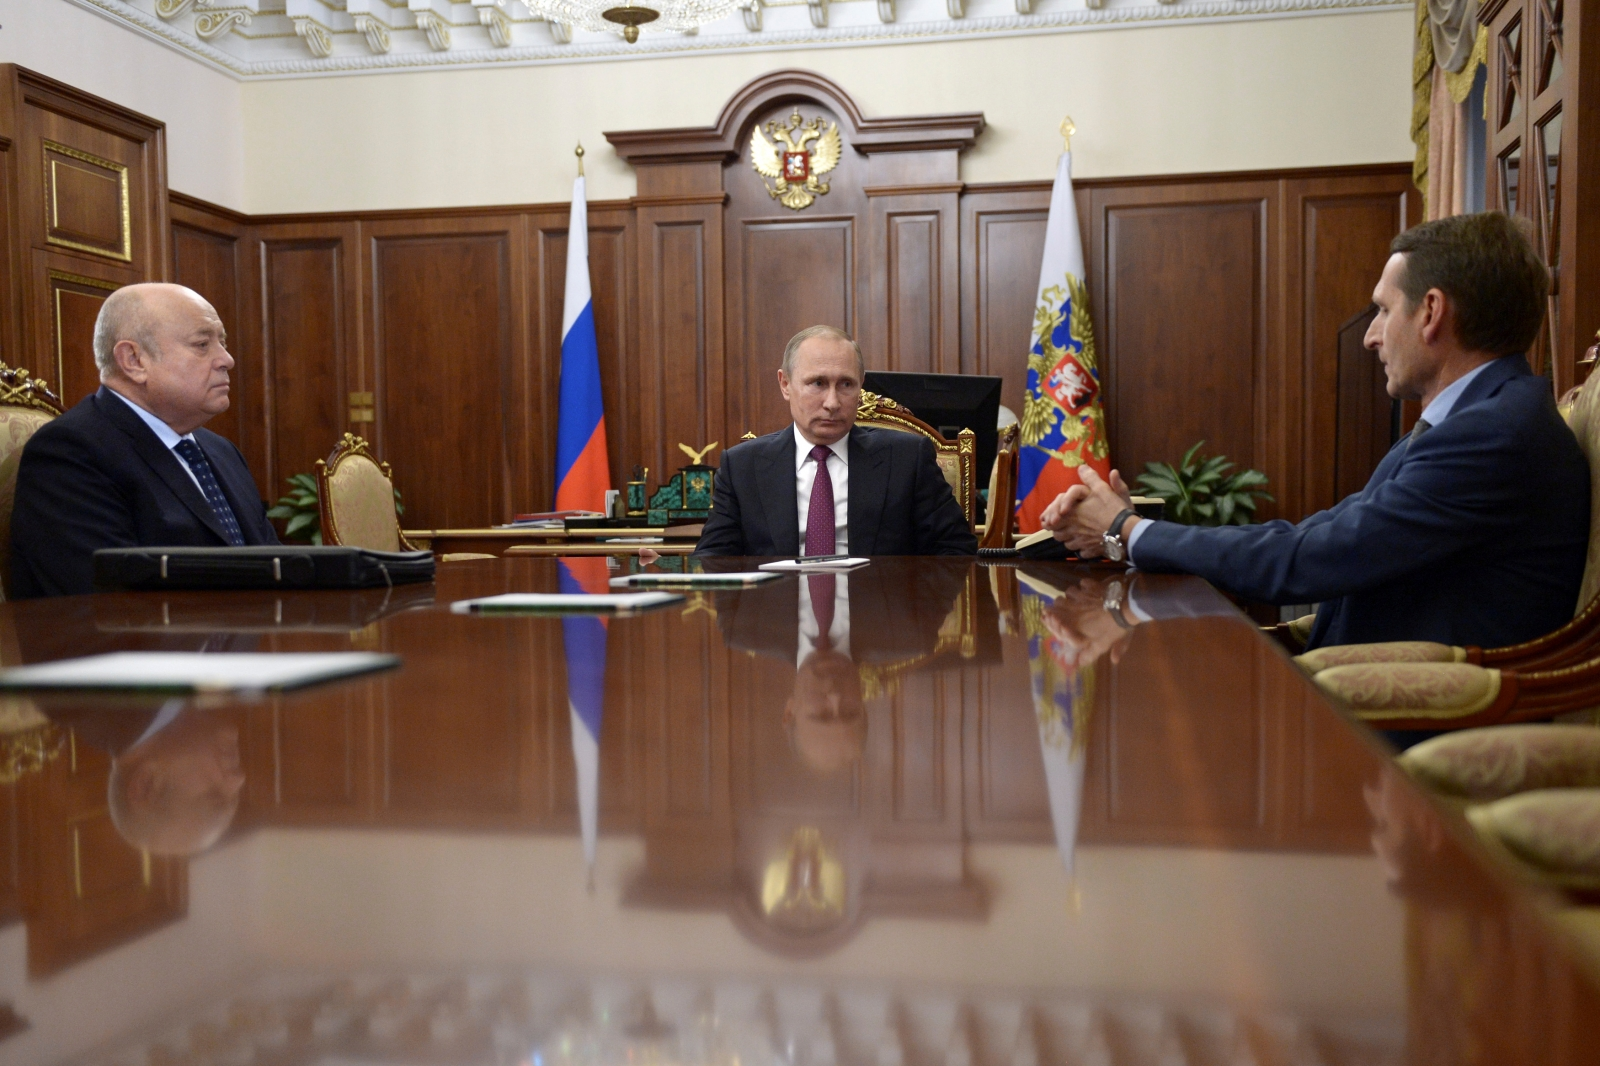 Putin appoints Naryshkin SVR chief